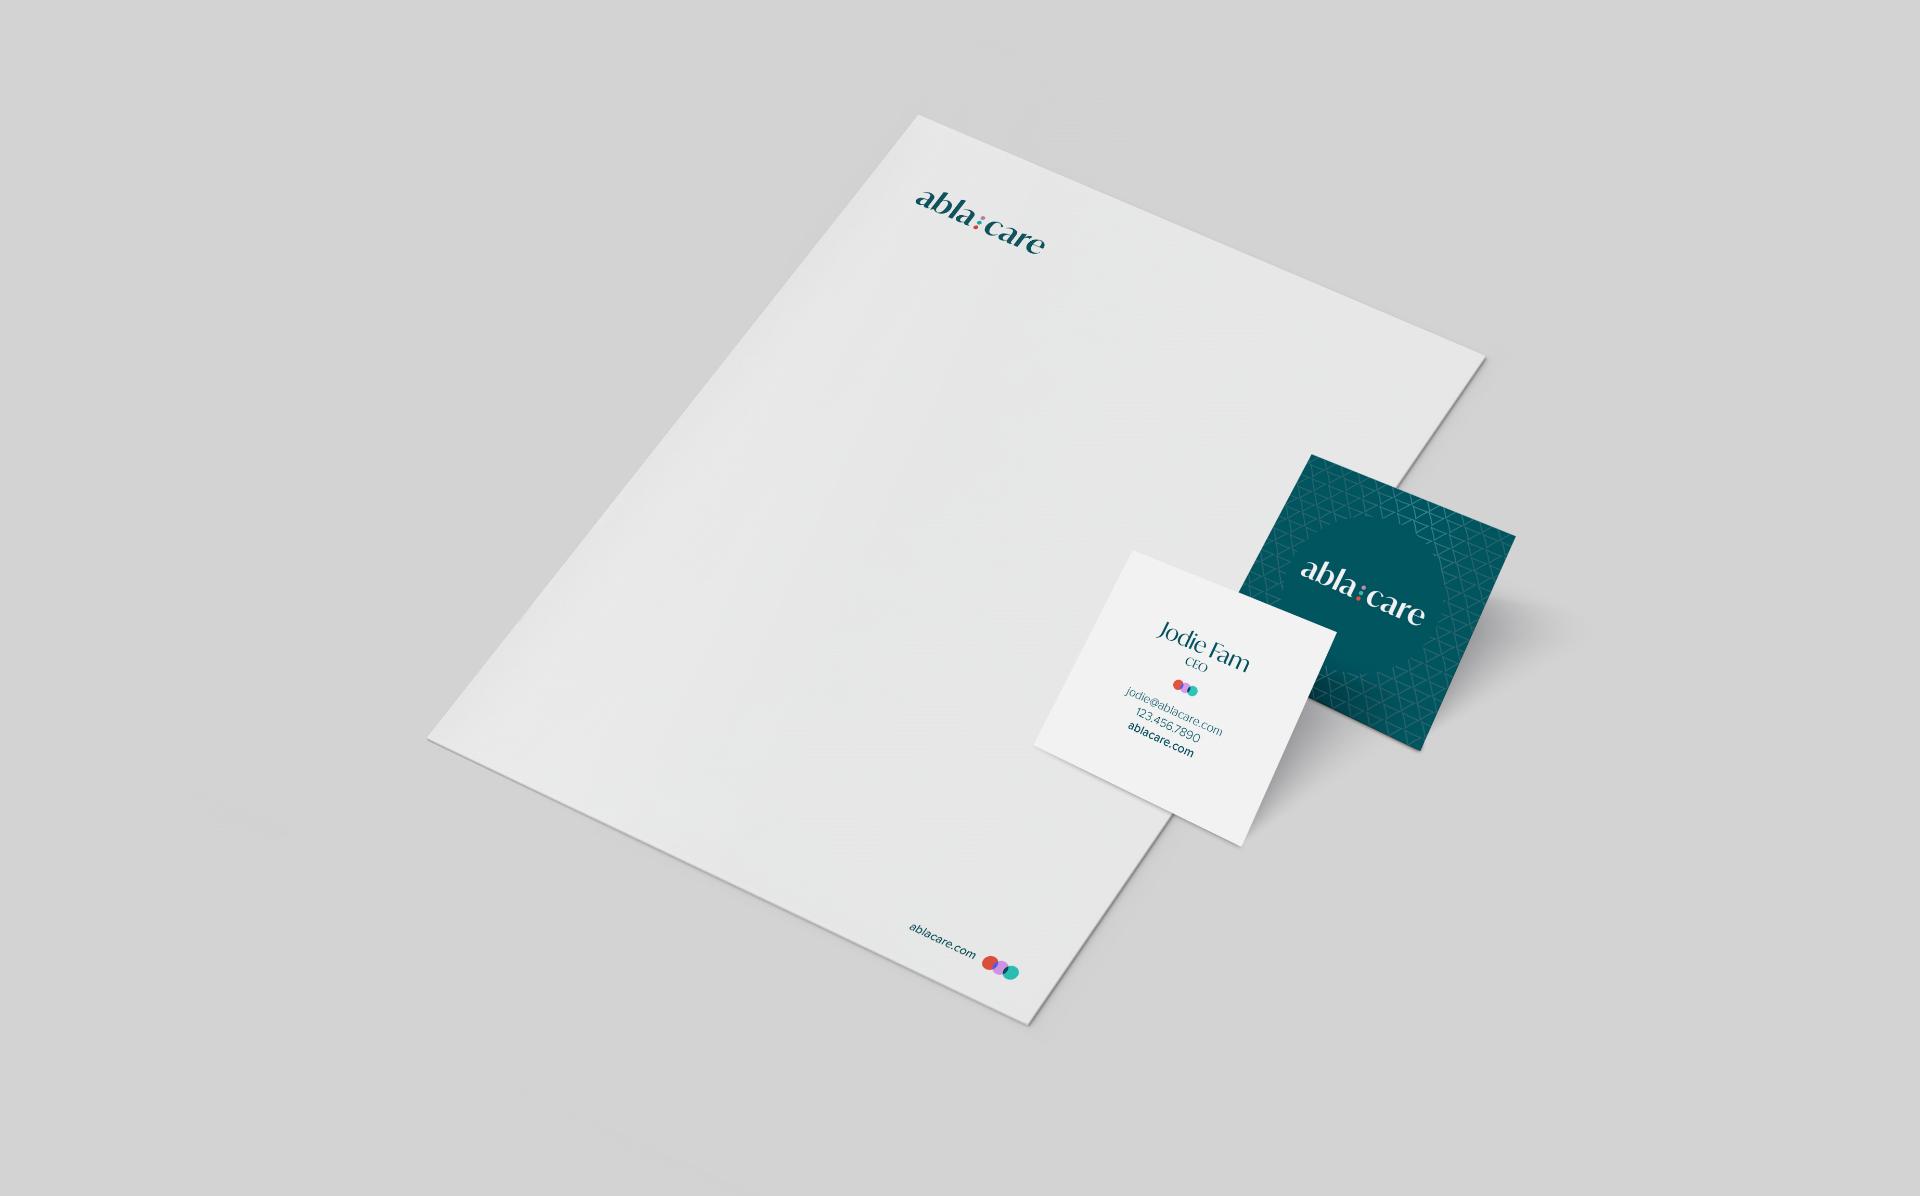 Ablacare Stationery Design